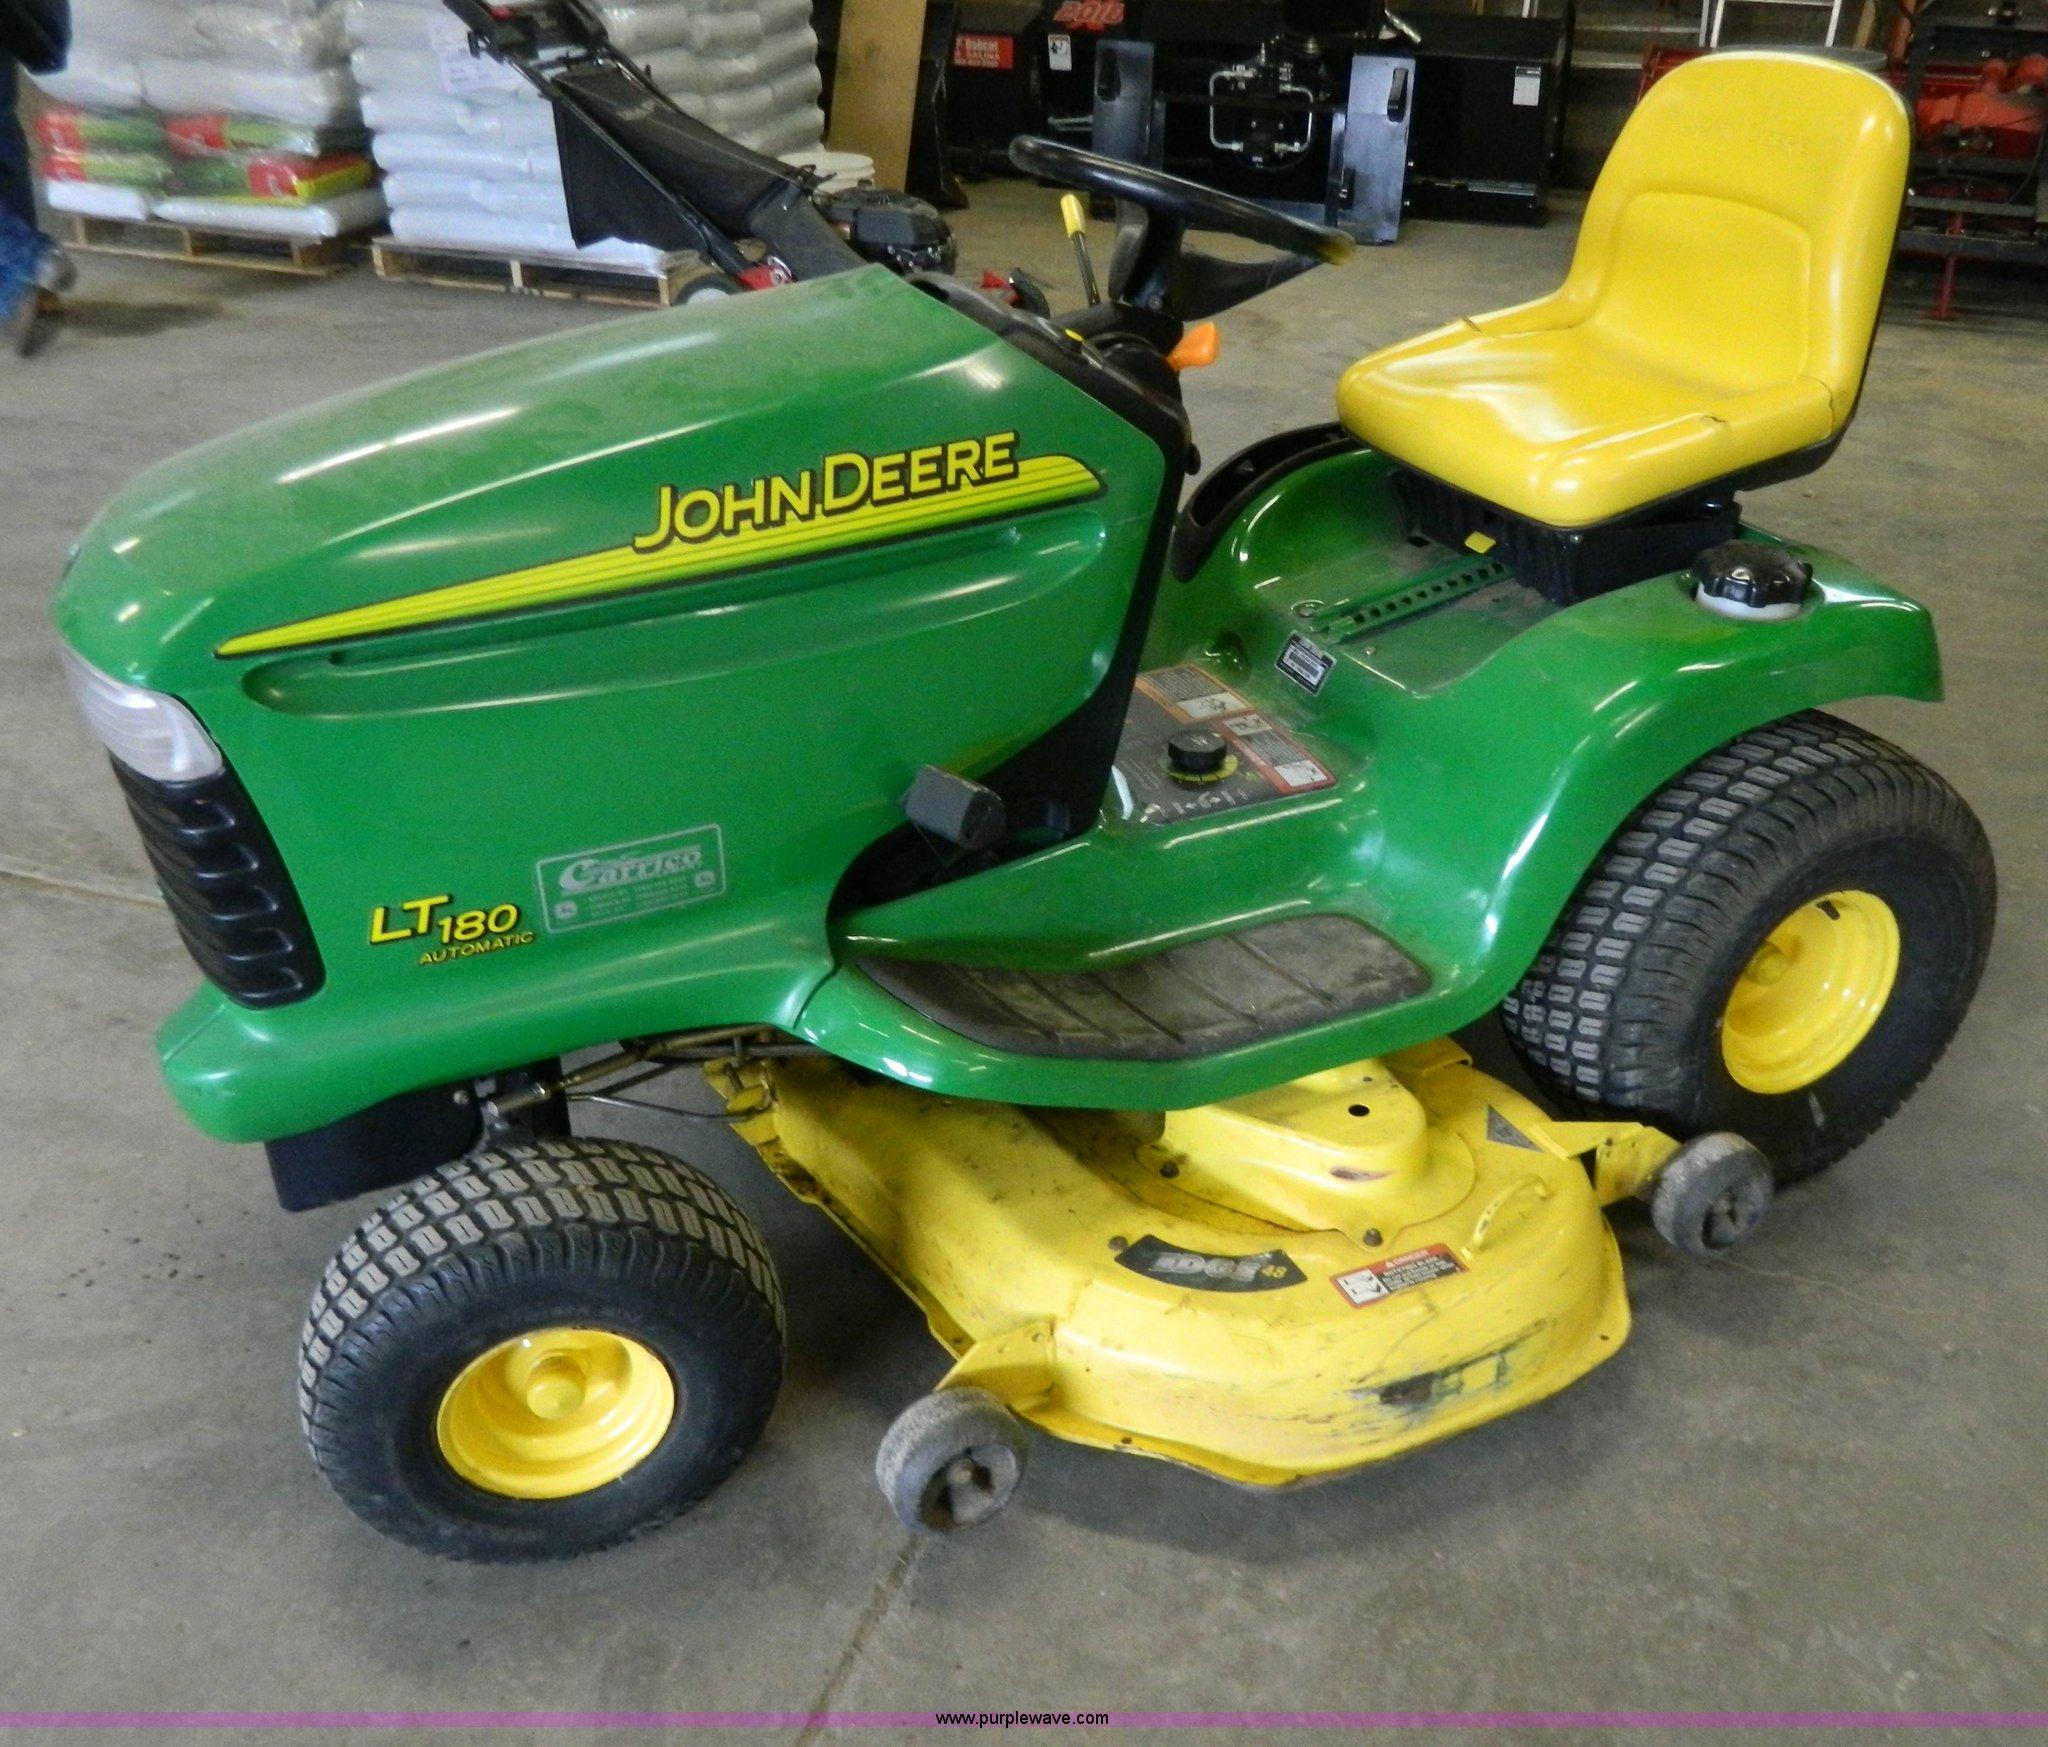 John Deere Lawn Tractors D120 : John deere lt lawn mower item w sold may